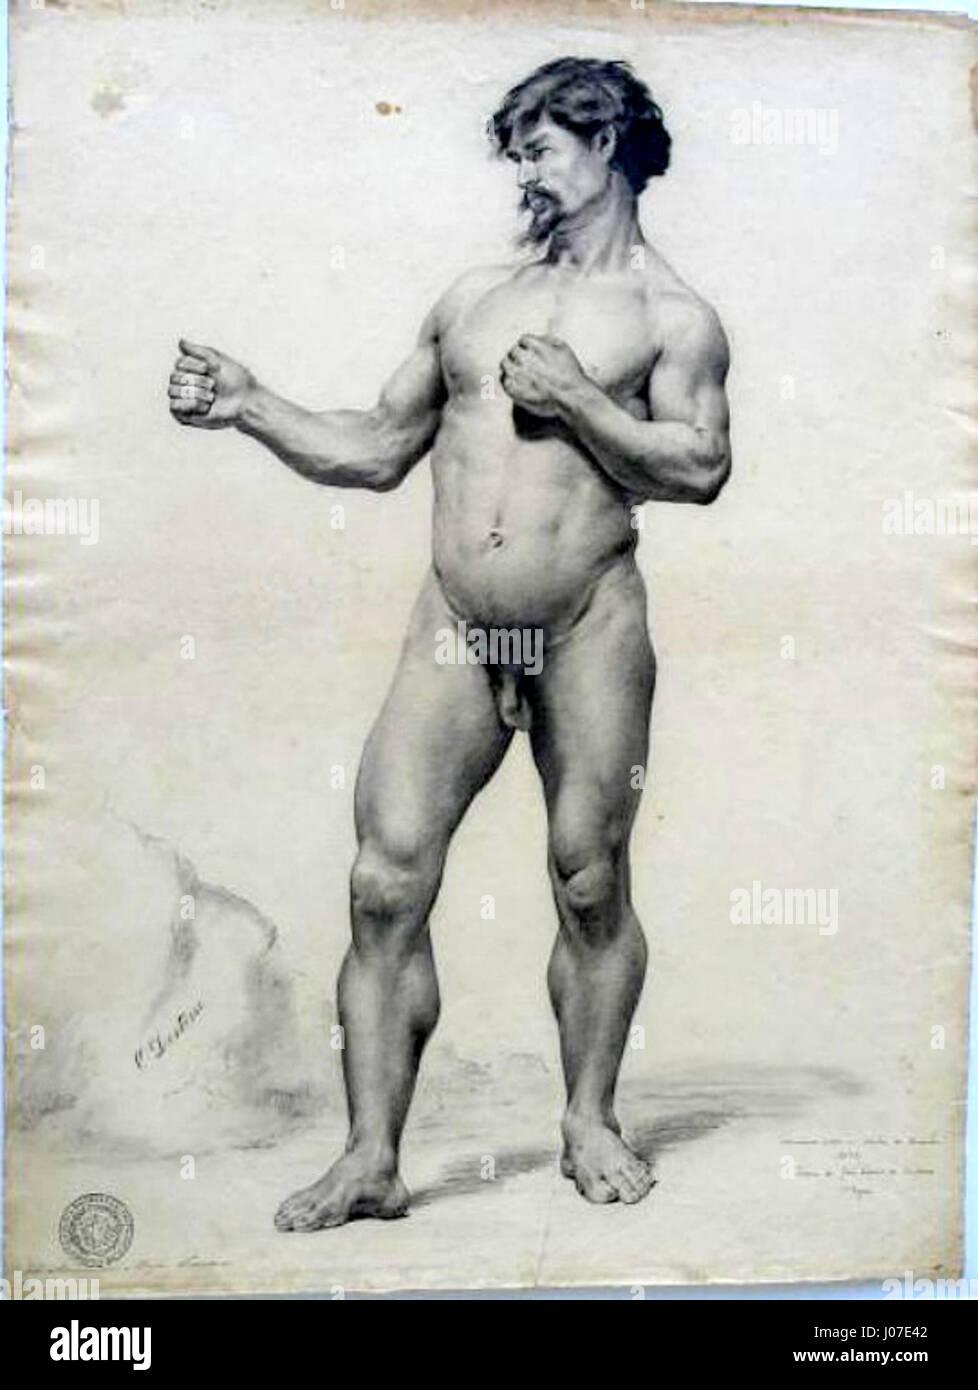 José Maria de Medeiros - Nu masculino (académico) Imagen De Stock